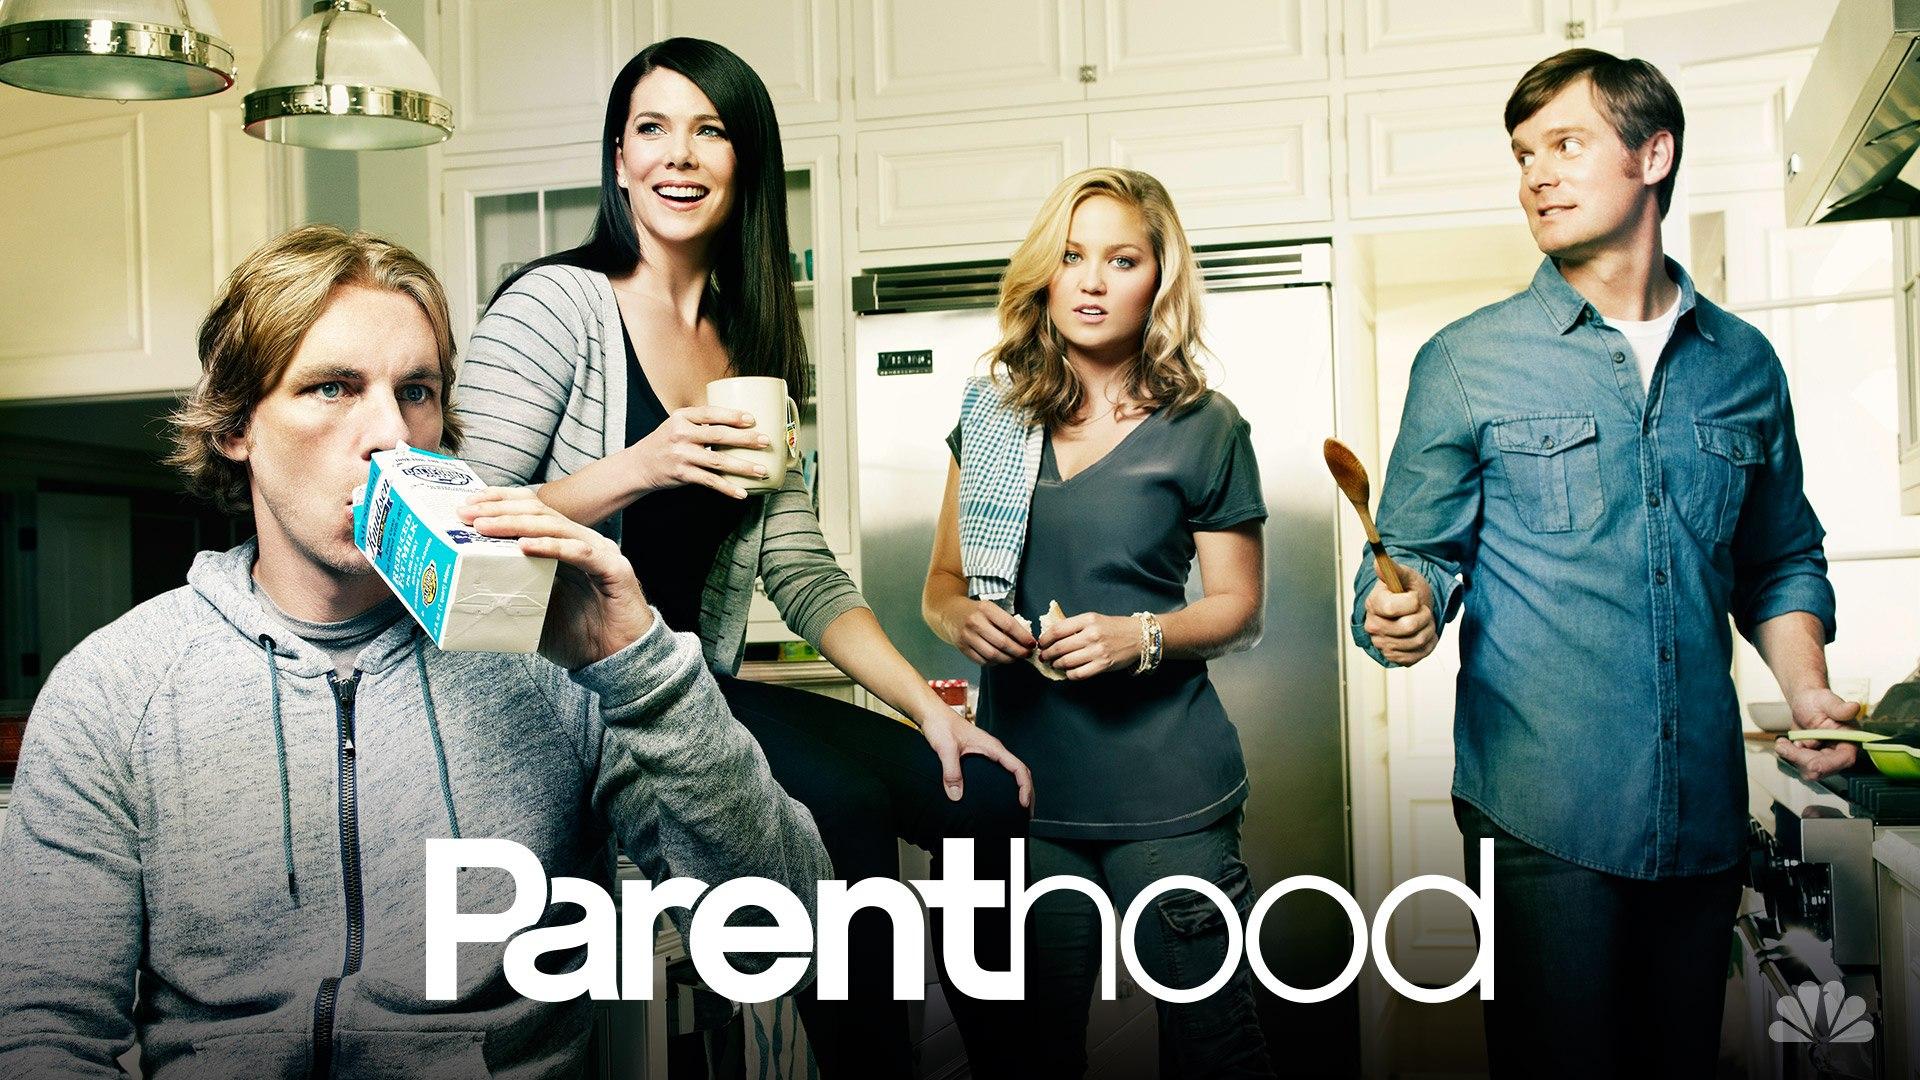 Parenthood is on NBC Thursdays at 9 Central. (Source)